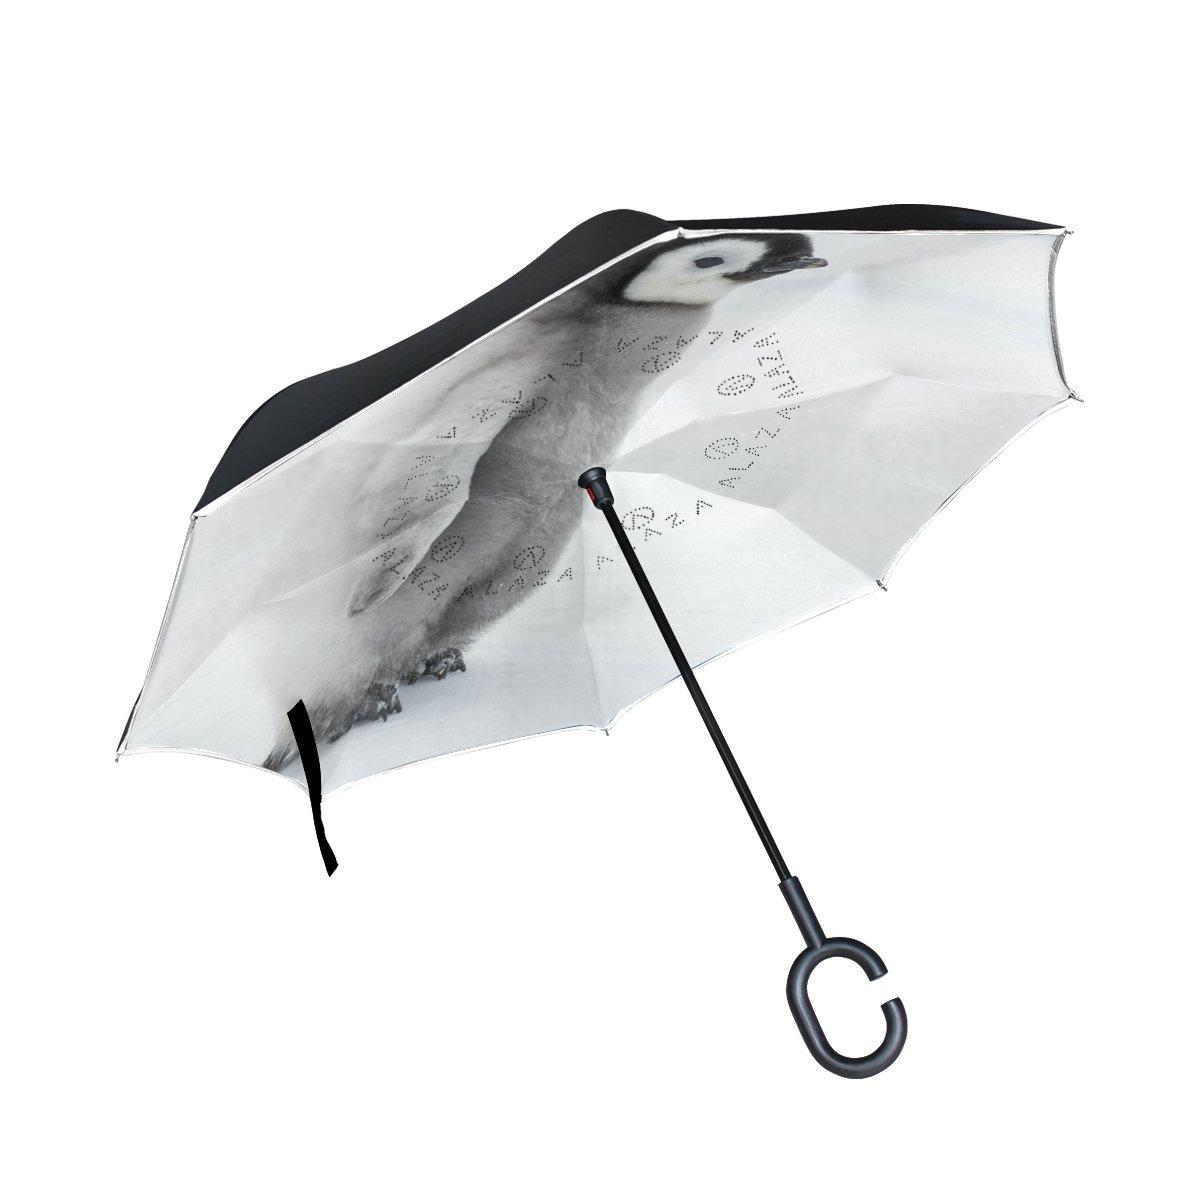 Alaza Double Layer Inverted傘Cars逆傘可愛いペンギン防風UVプルーフ旅行アウトドア傘   B07CM5HSJT